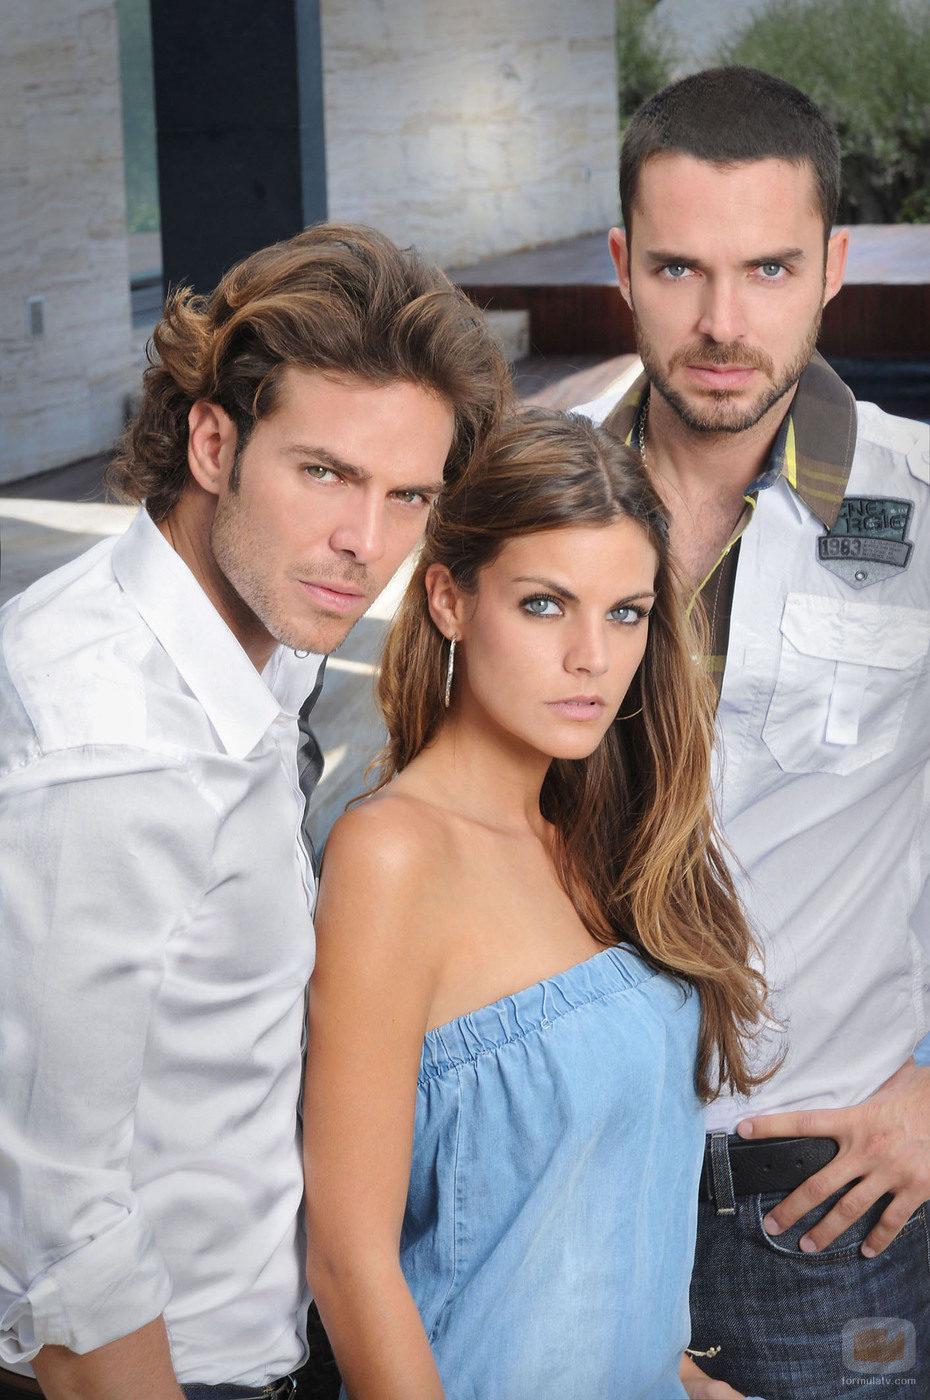 Manolo Cardona, Amaia Salamanca y Juan Alfonso Baptista